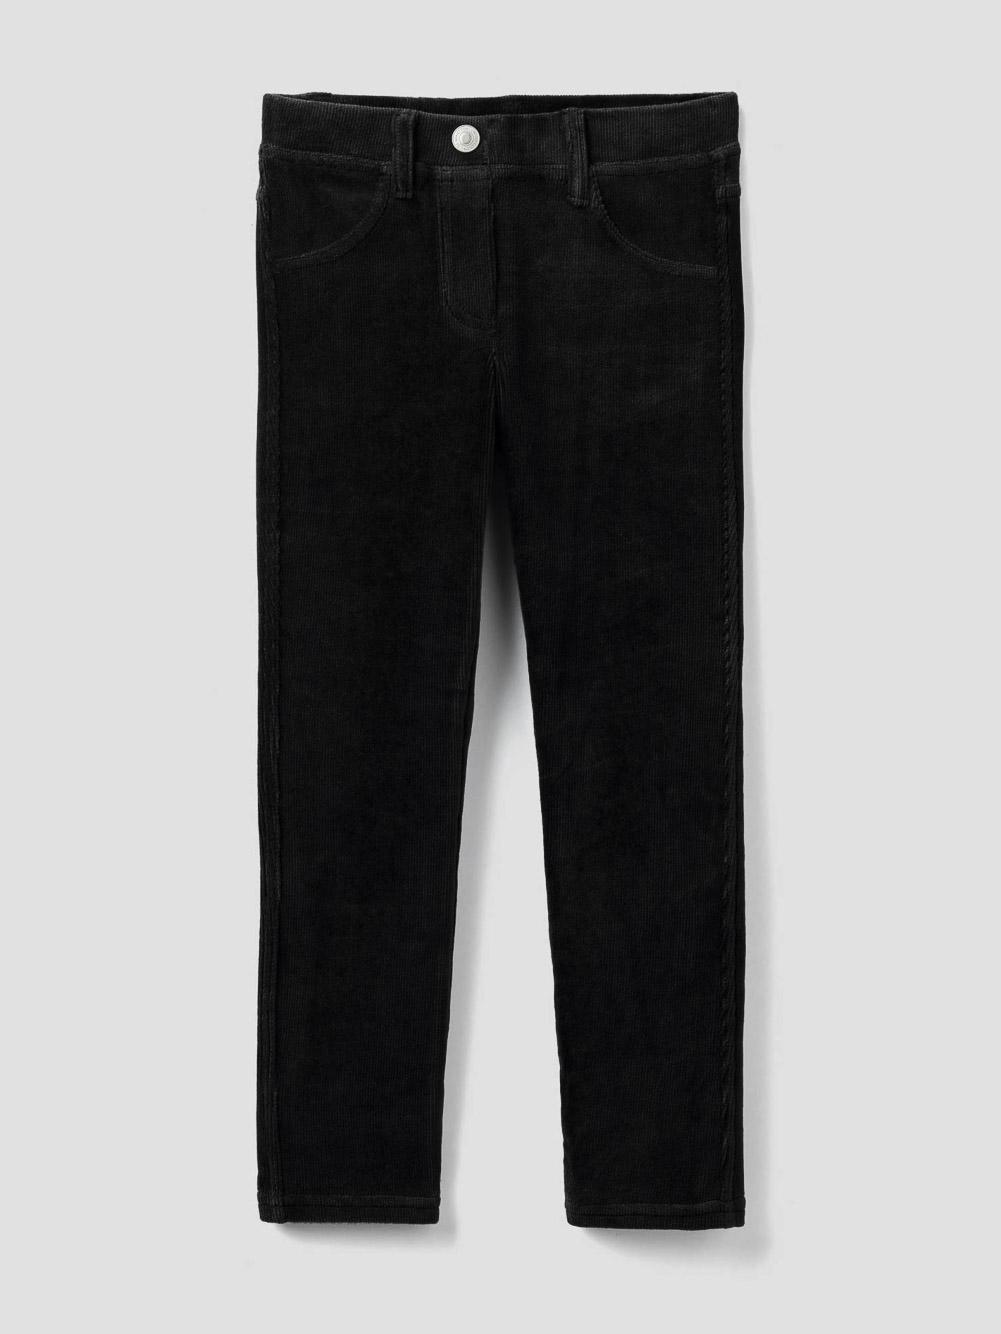 012 BENETTON Παντελόνι super skinny 4DZB57LZ0 20A100